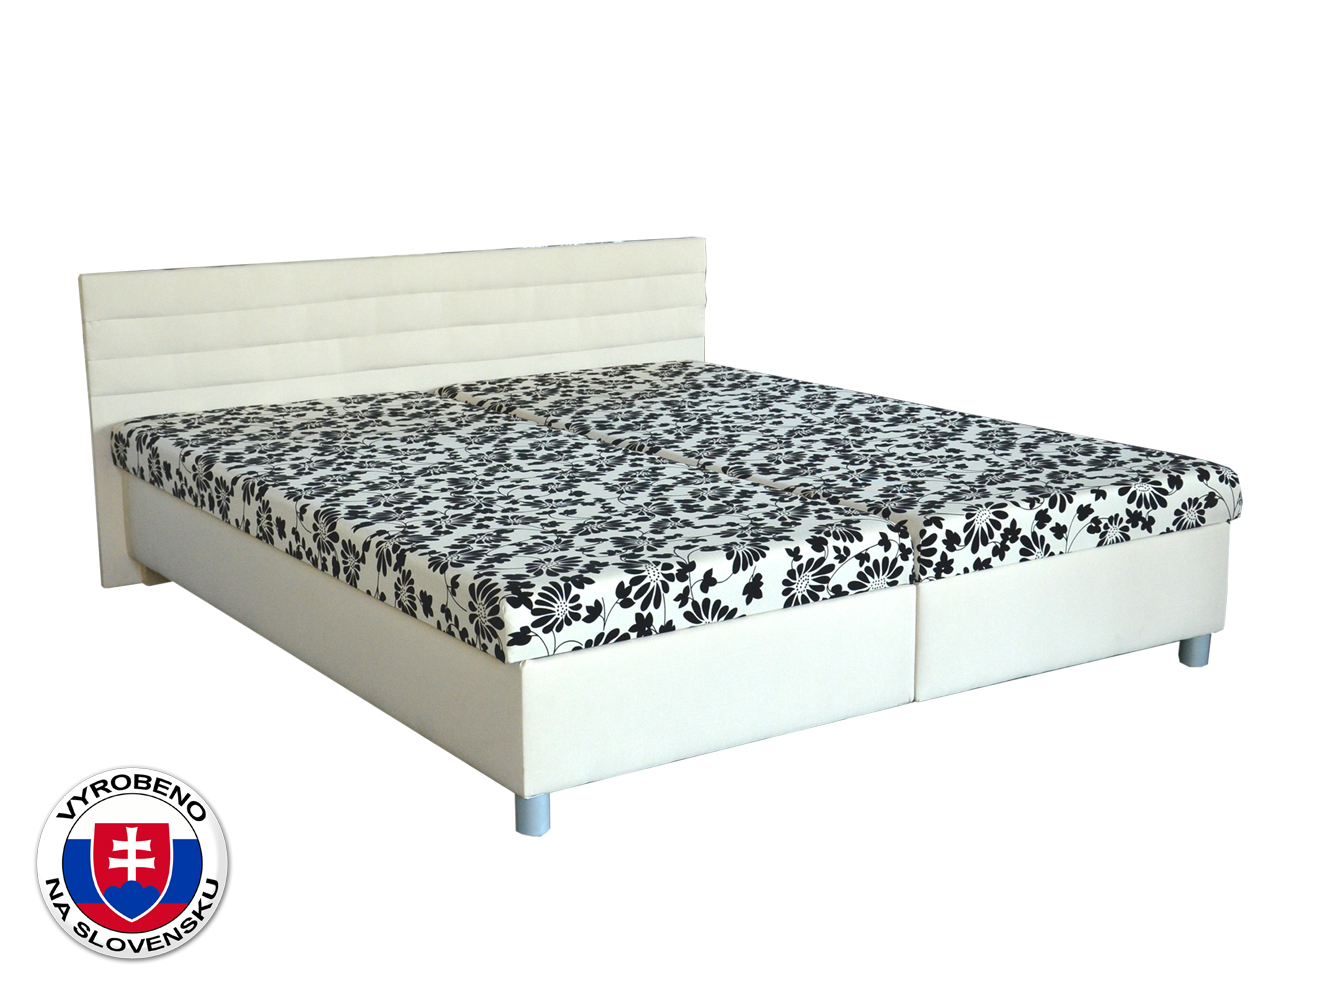 Manželská postel 160 cm - BRW - Etile (bílá) (s matracemi)